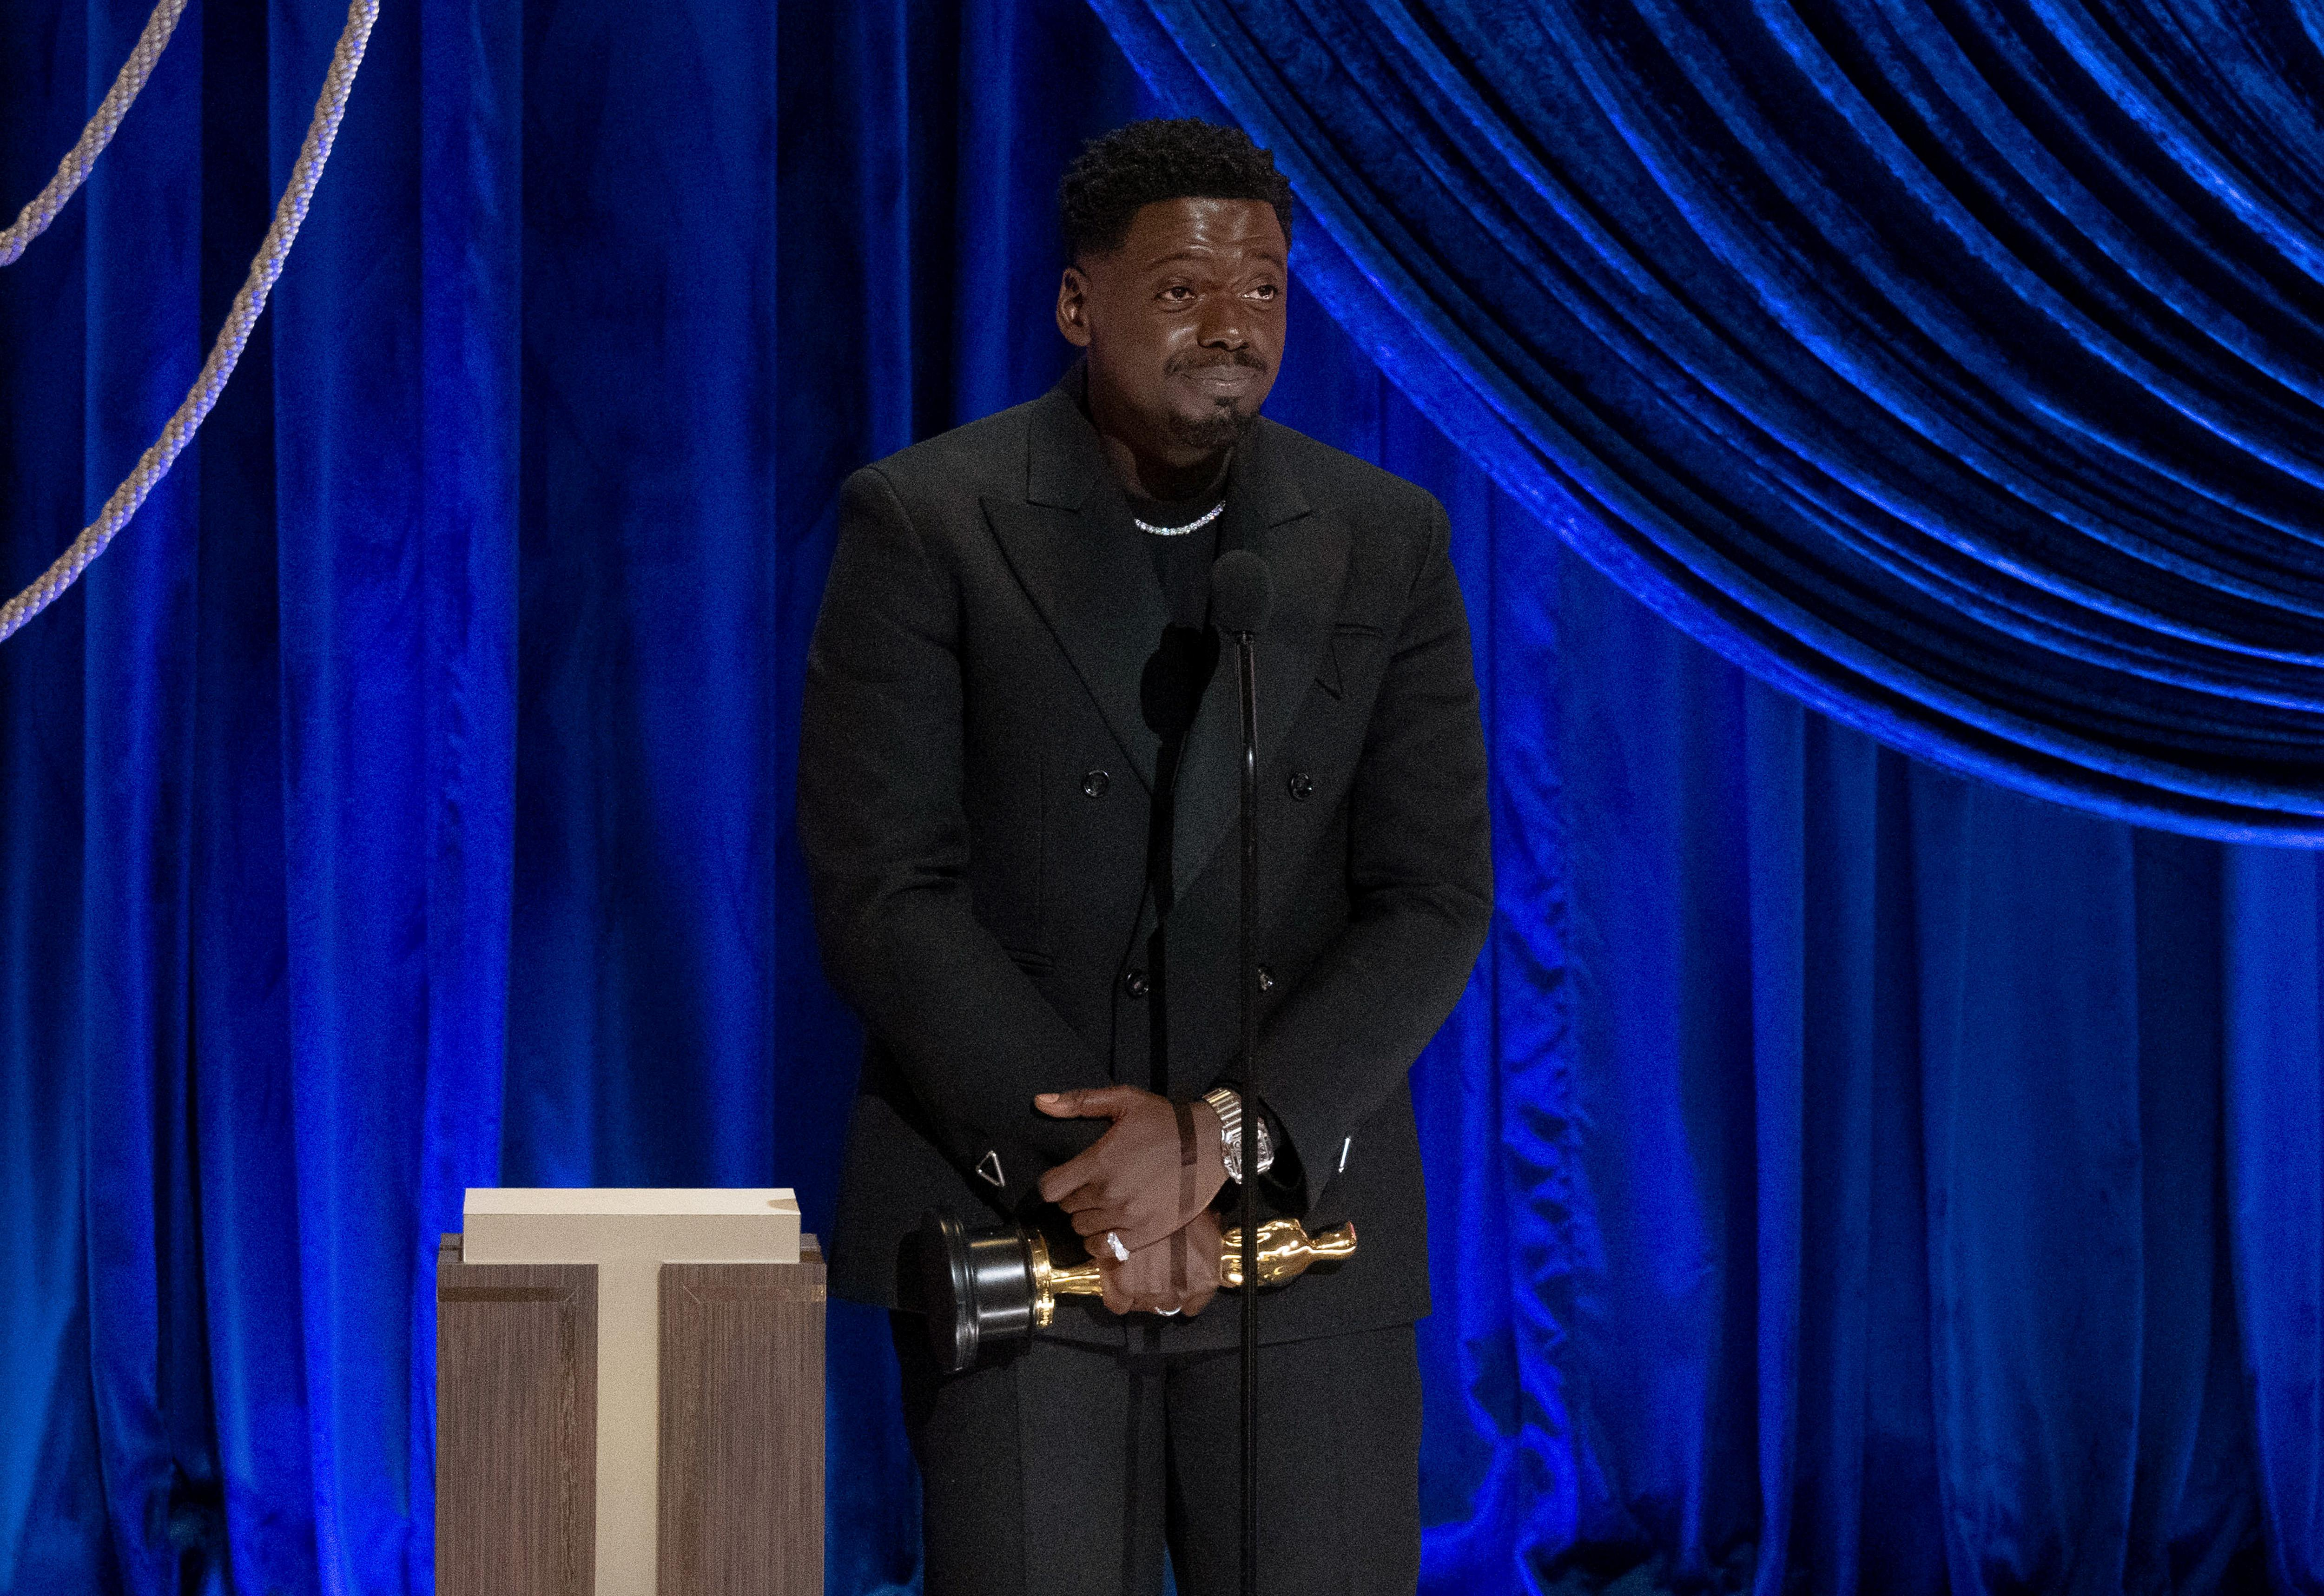 Daniel Kaluuya, looking stylish, holding his Oscar